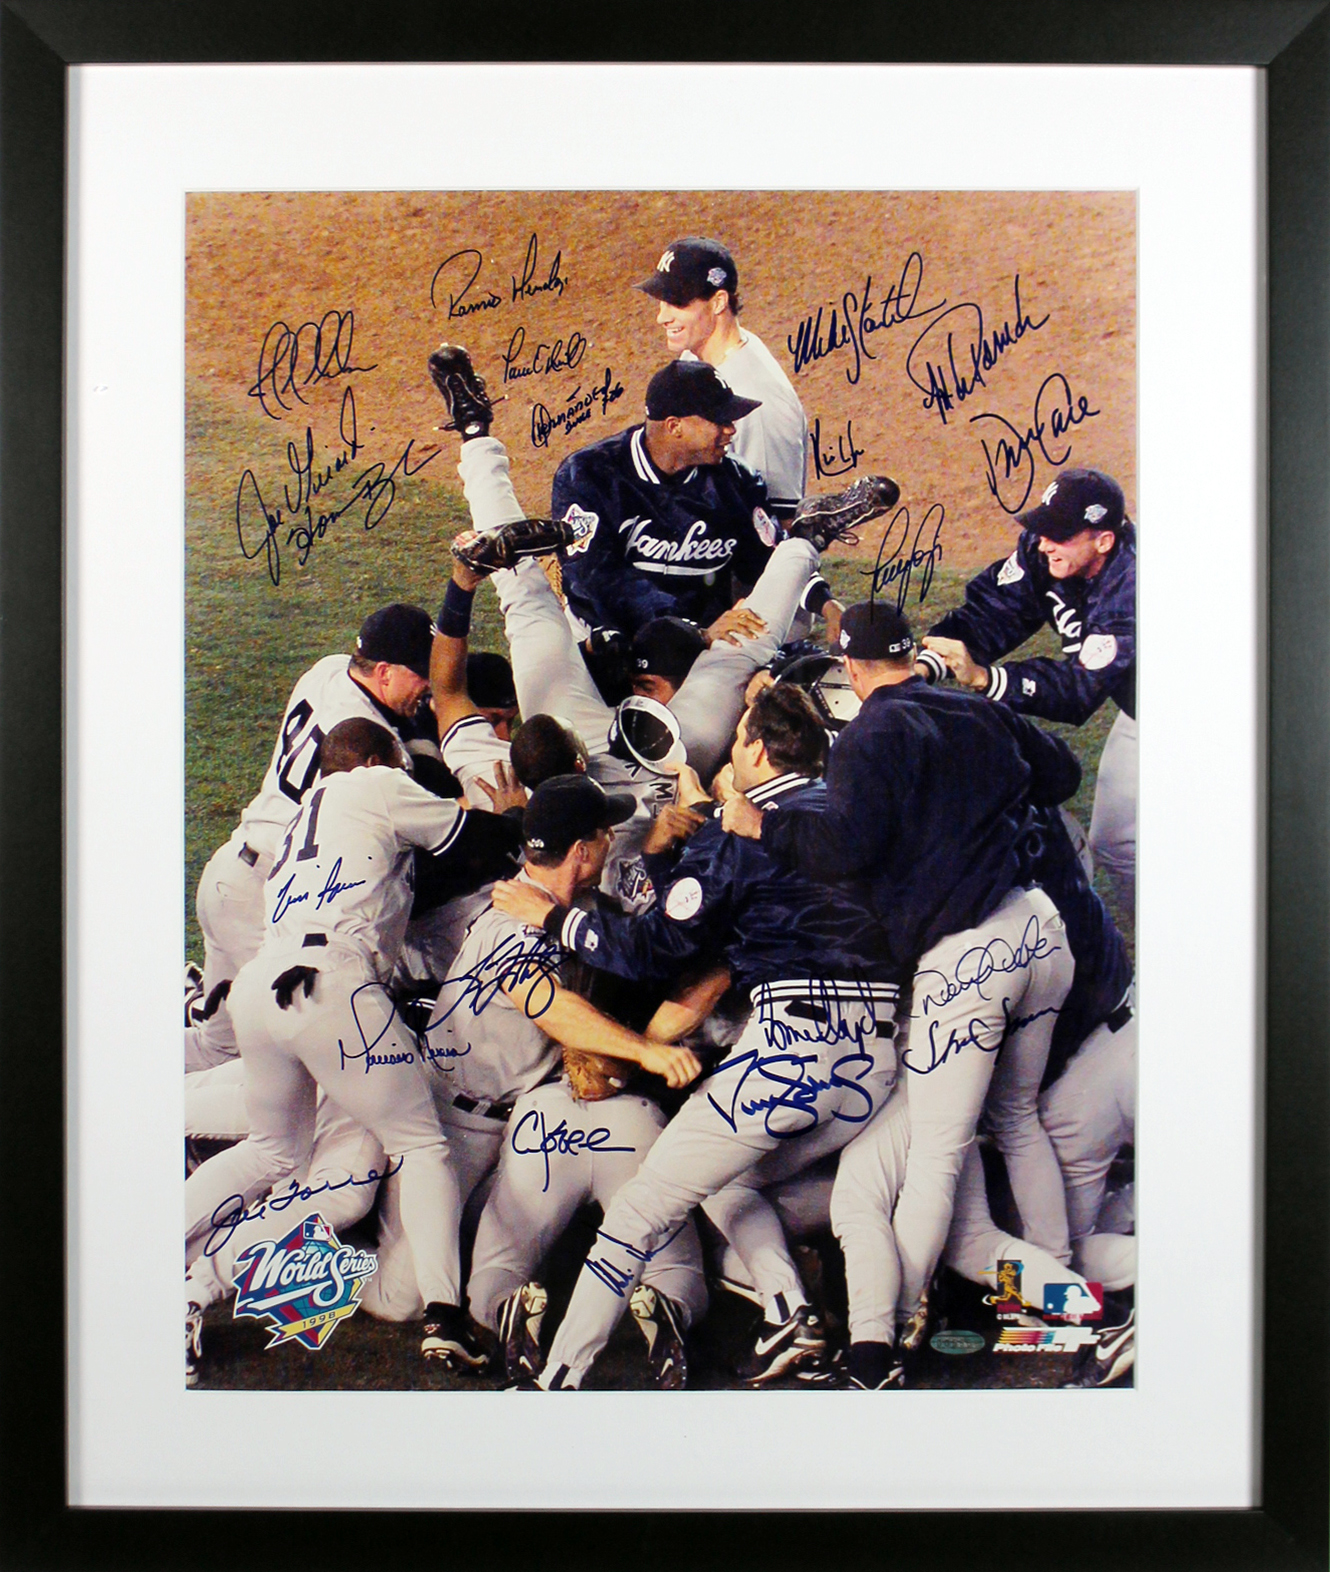 1998 Yankees (21) Jeter, Rivera, Torre Signed & Framed 16X20 Photo BAS #A03664